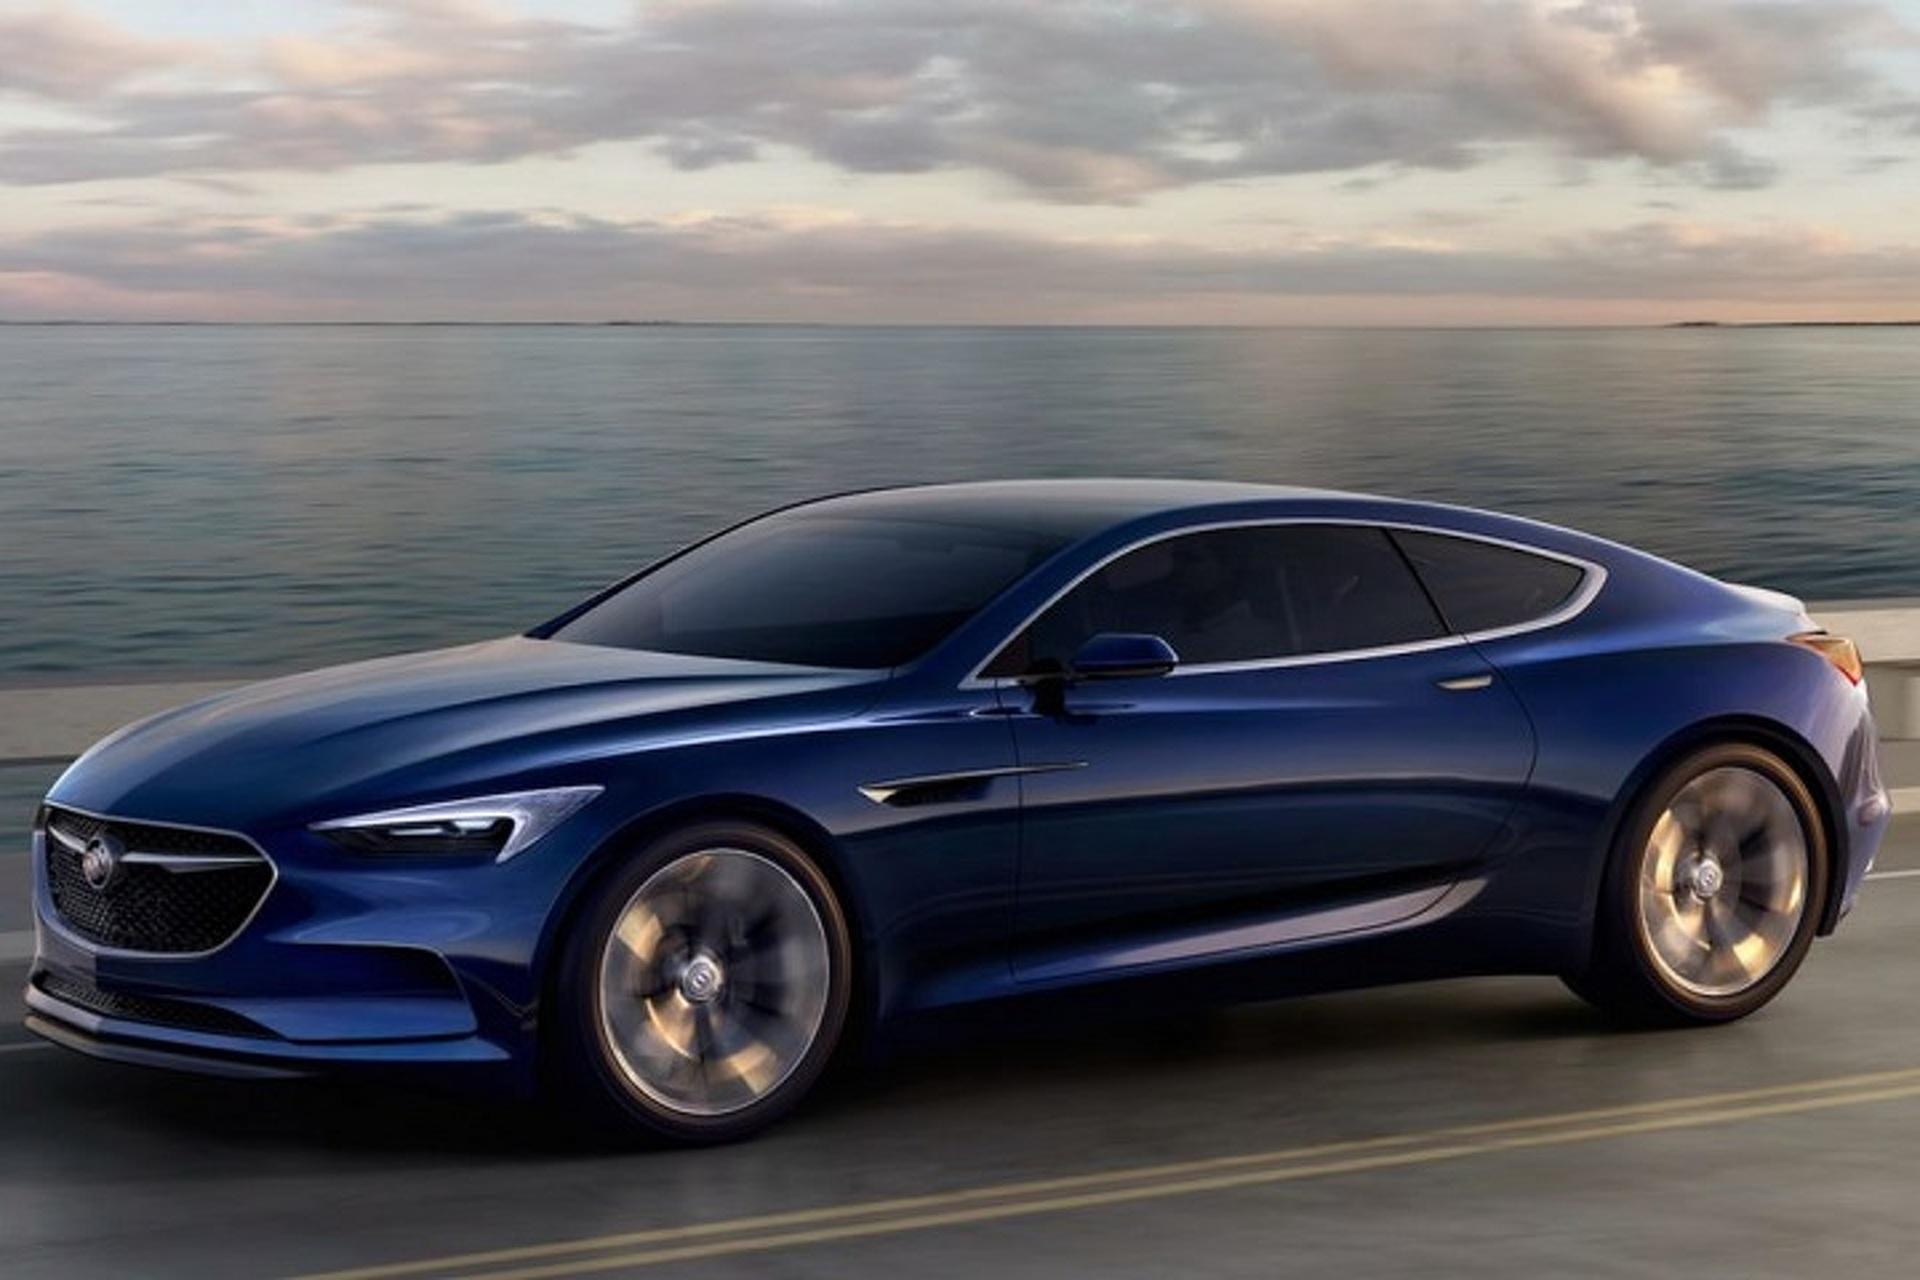 Buick Won't Build The Beautiful Avista Coupe Concept